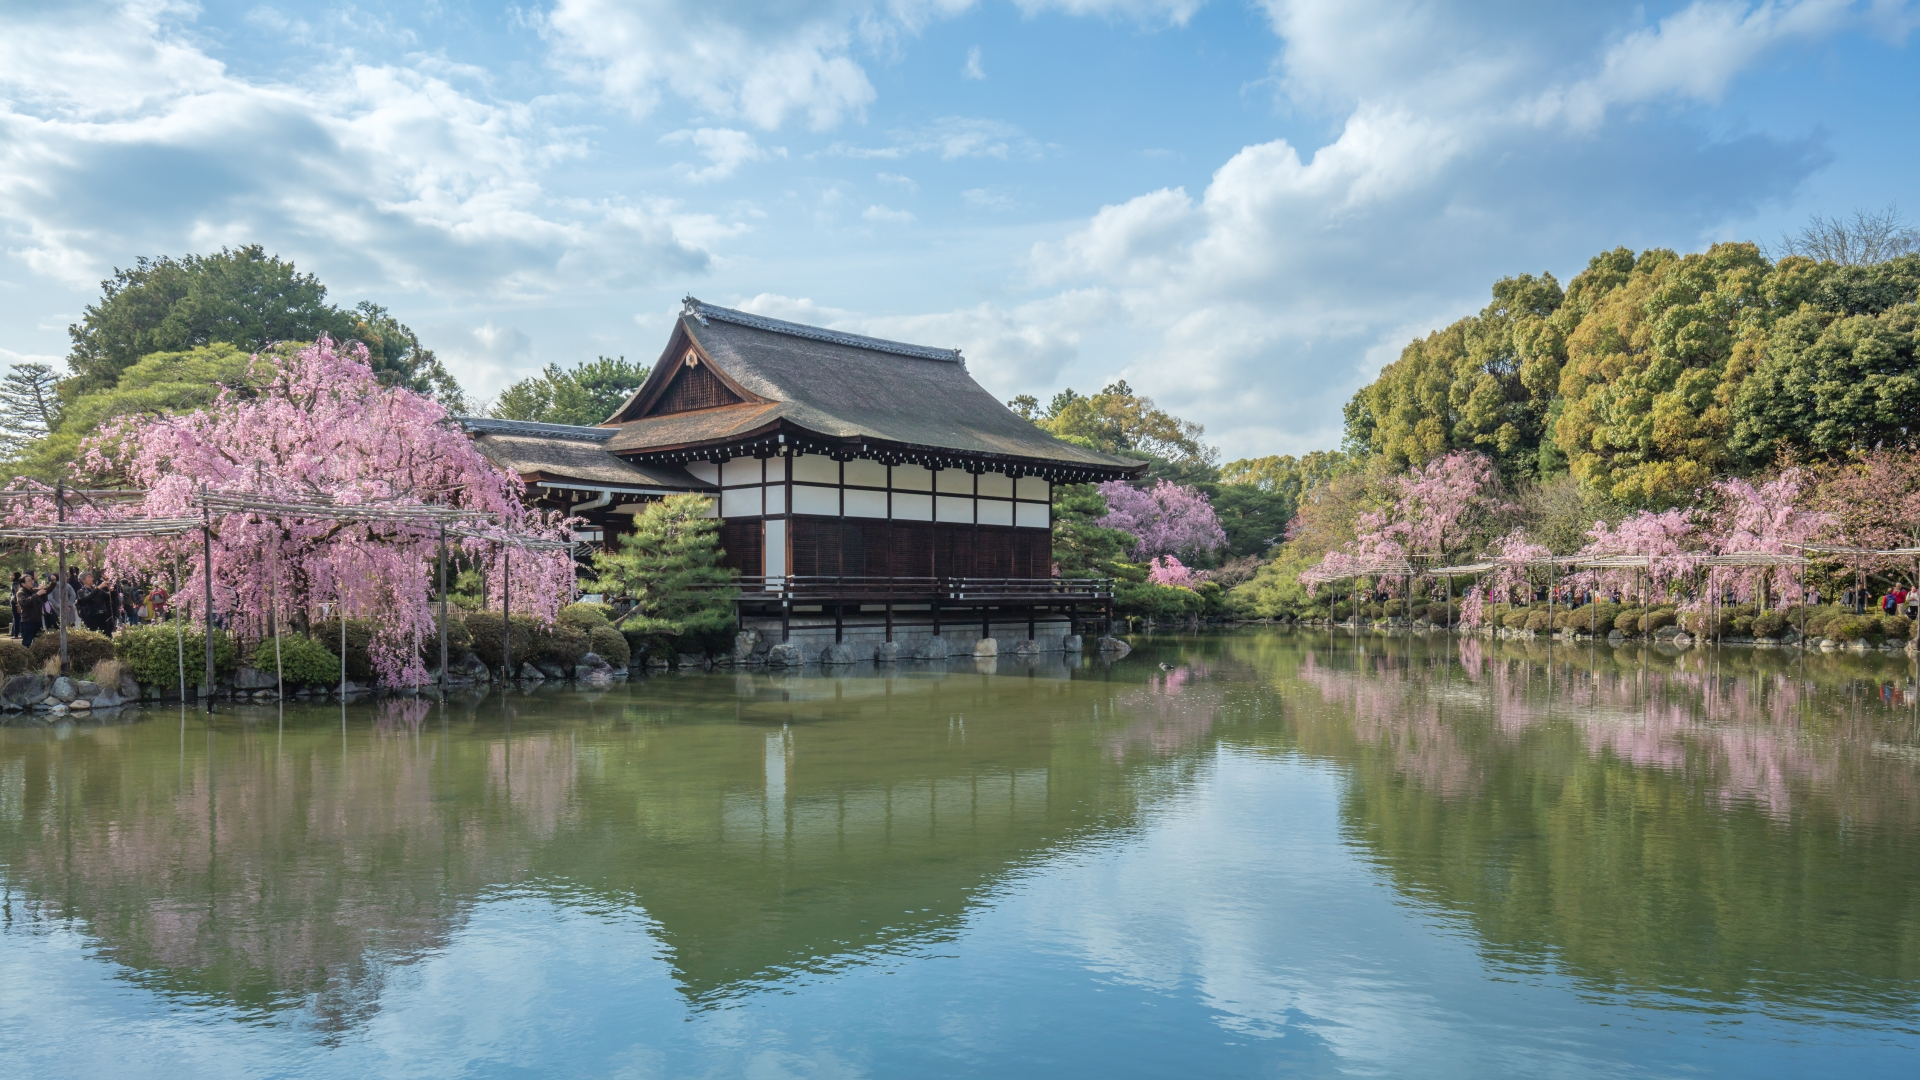 3963407_m 京都府 平安神宮(水面に映る桜の景色が美しい春におすすめ桜写真スポット! 撮影した写真の紹介、アクセス情報など)